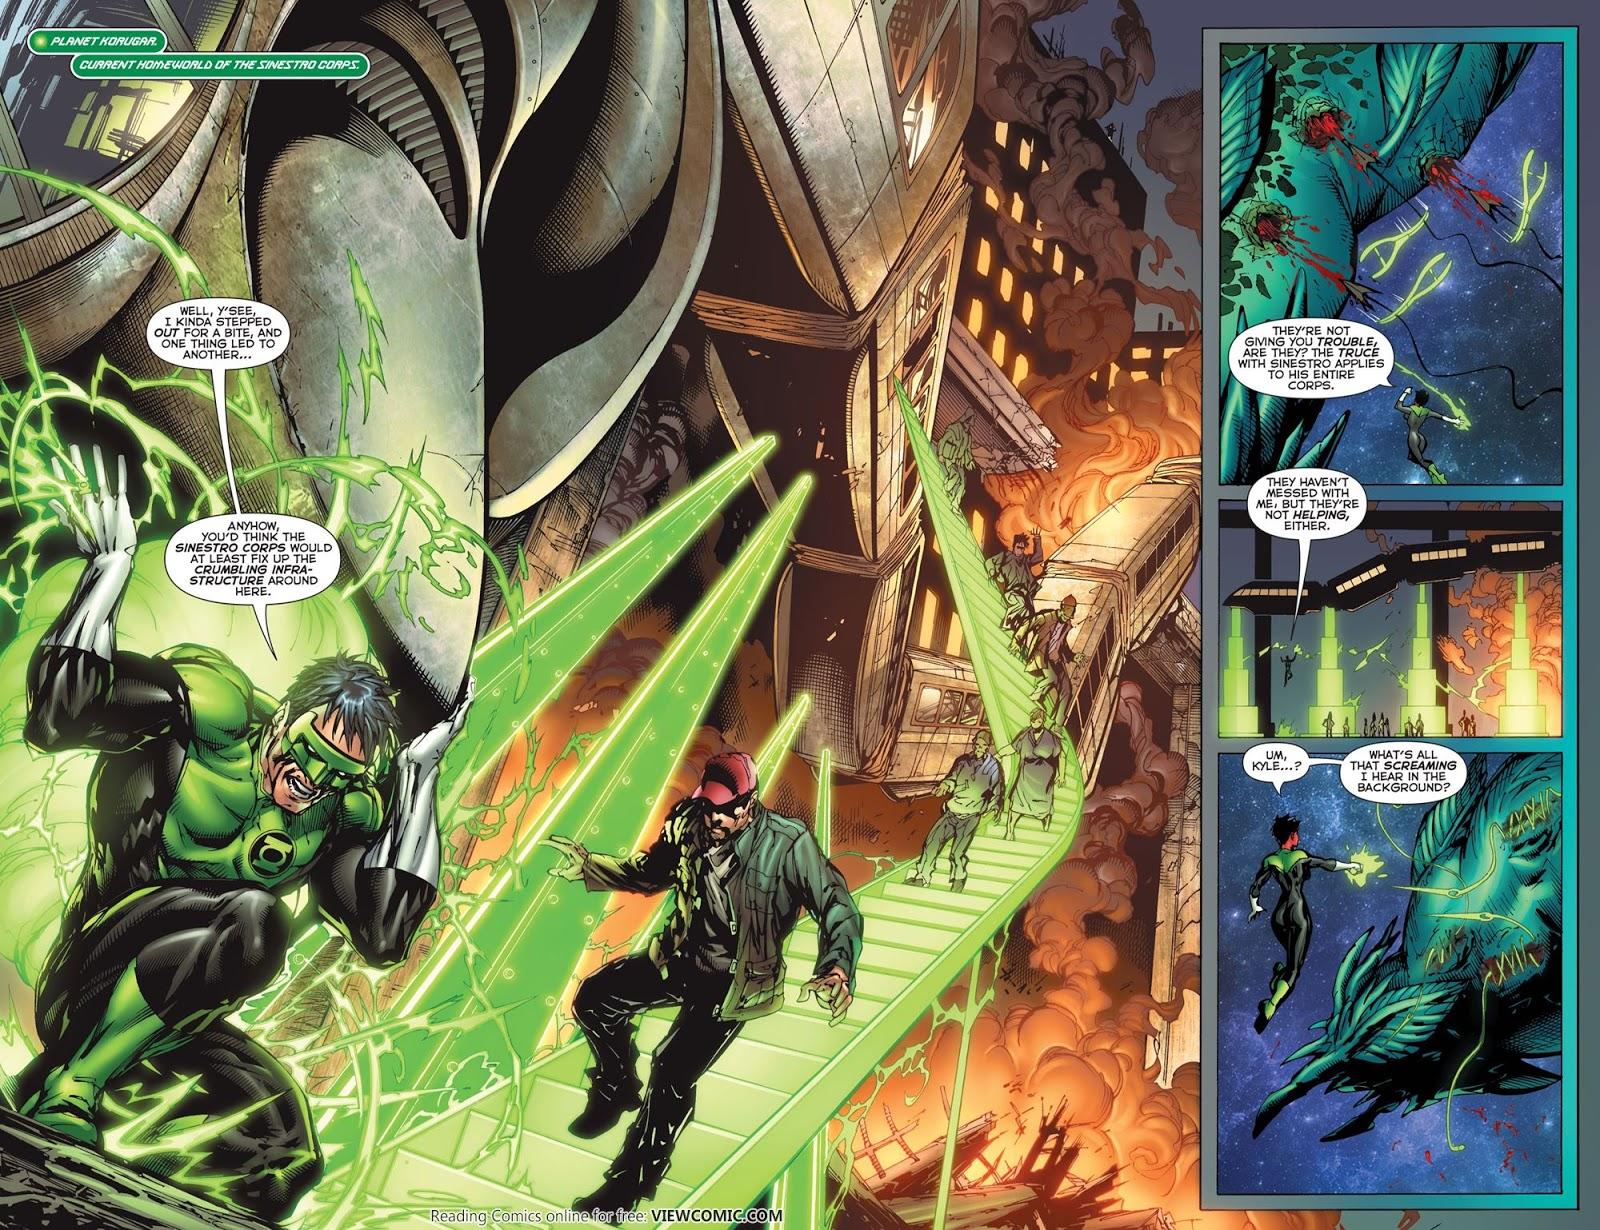 green lantern corps v2 053 2010 vietcomic net reading comics for free